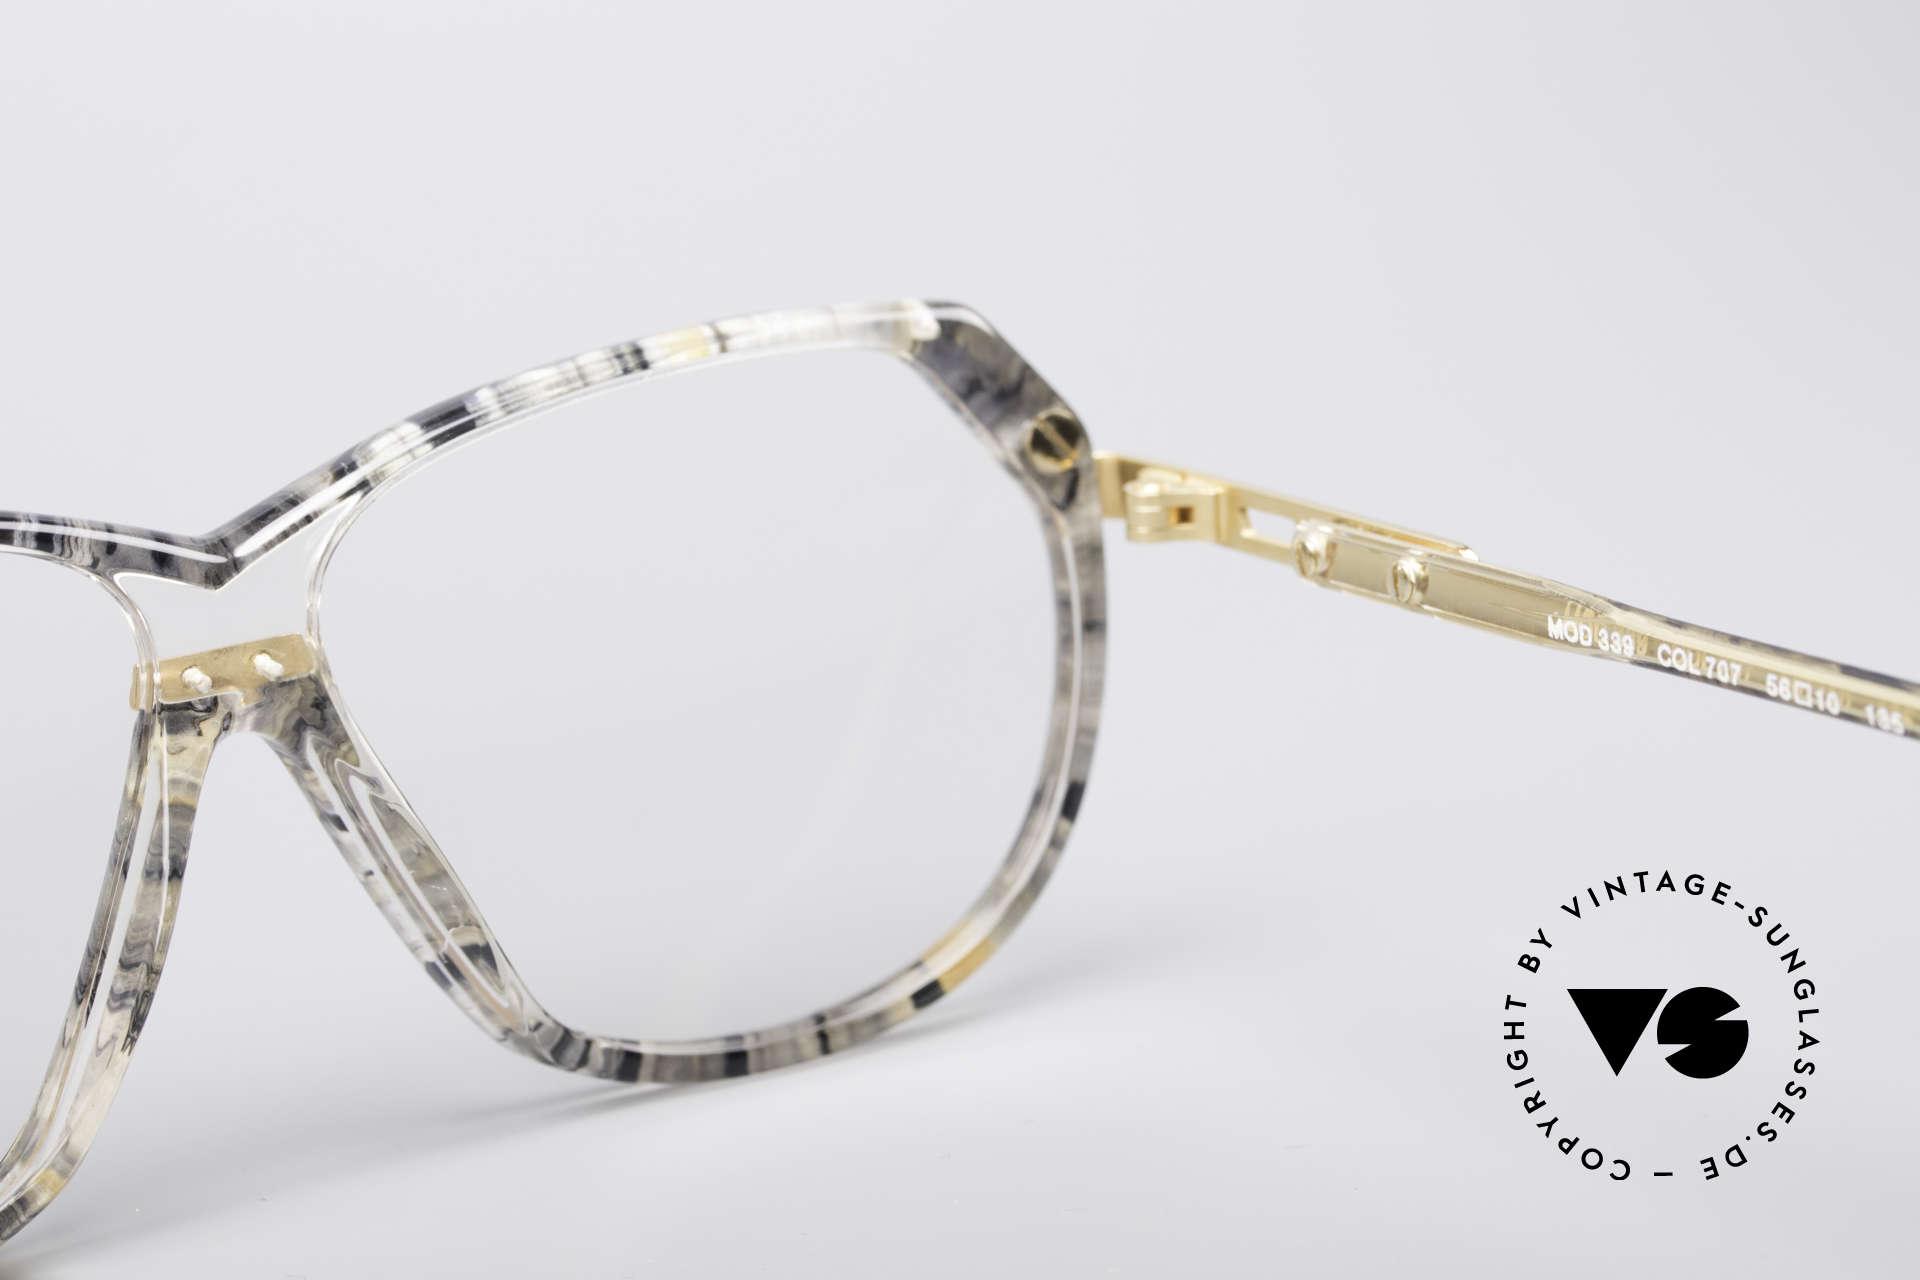 Cazal 339 No Retro 90's Vintage Specs, Size: small, Made for Women